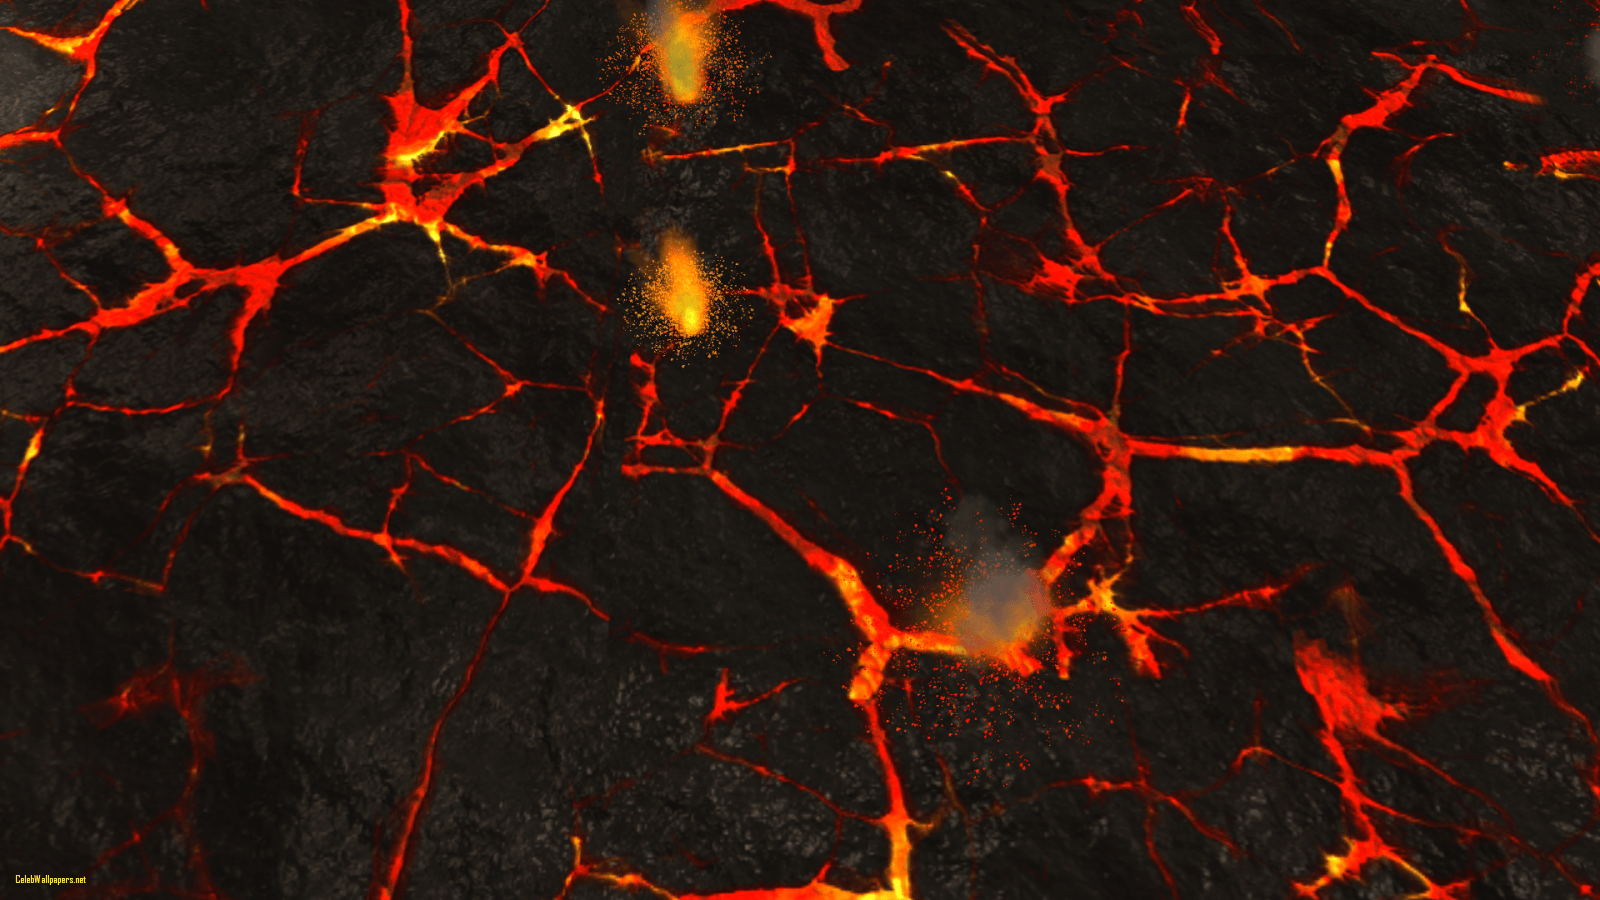 lava background images